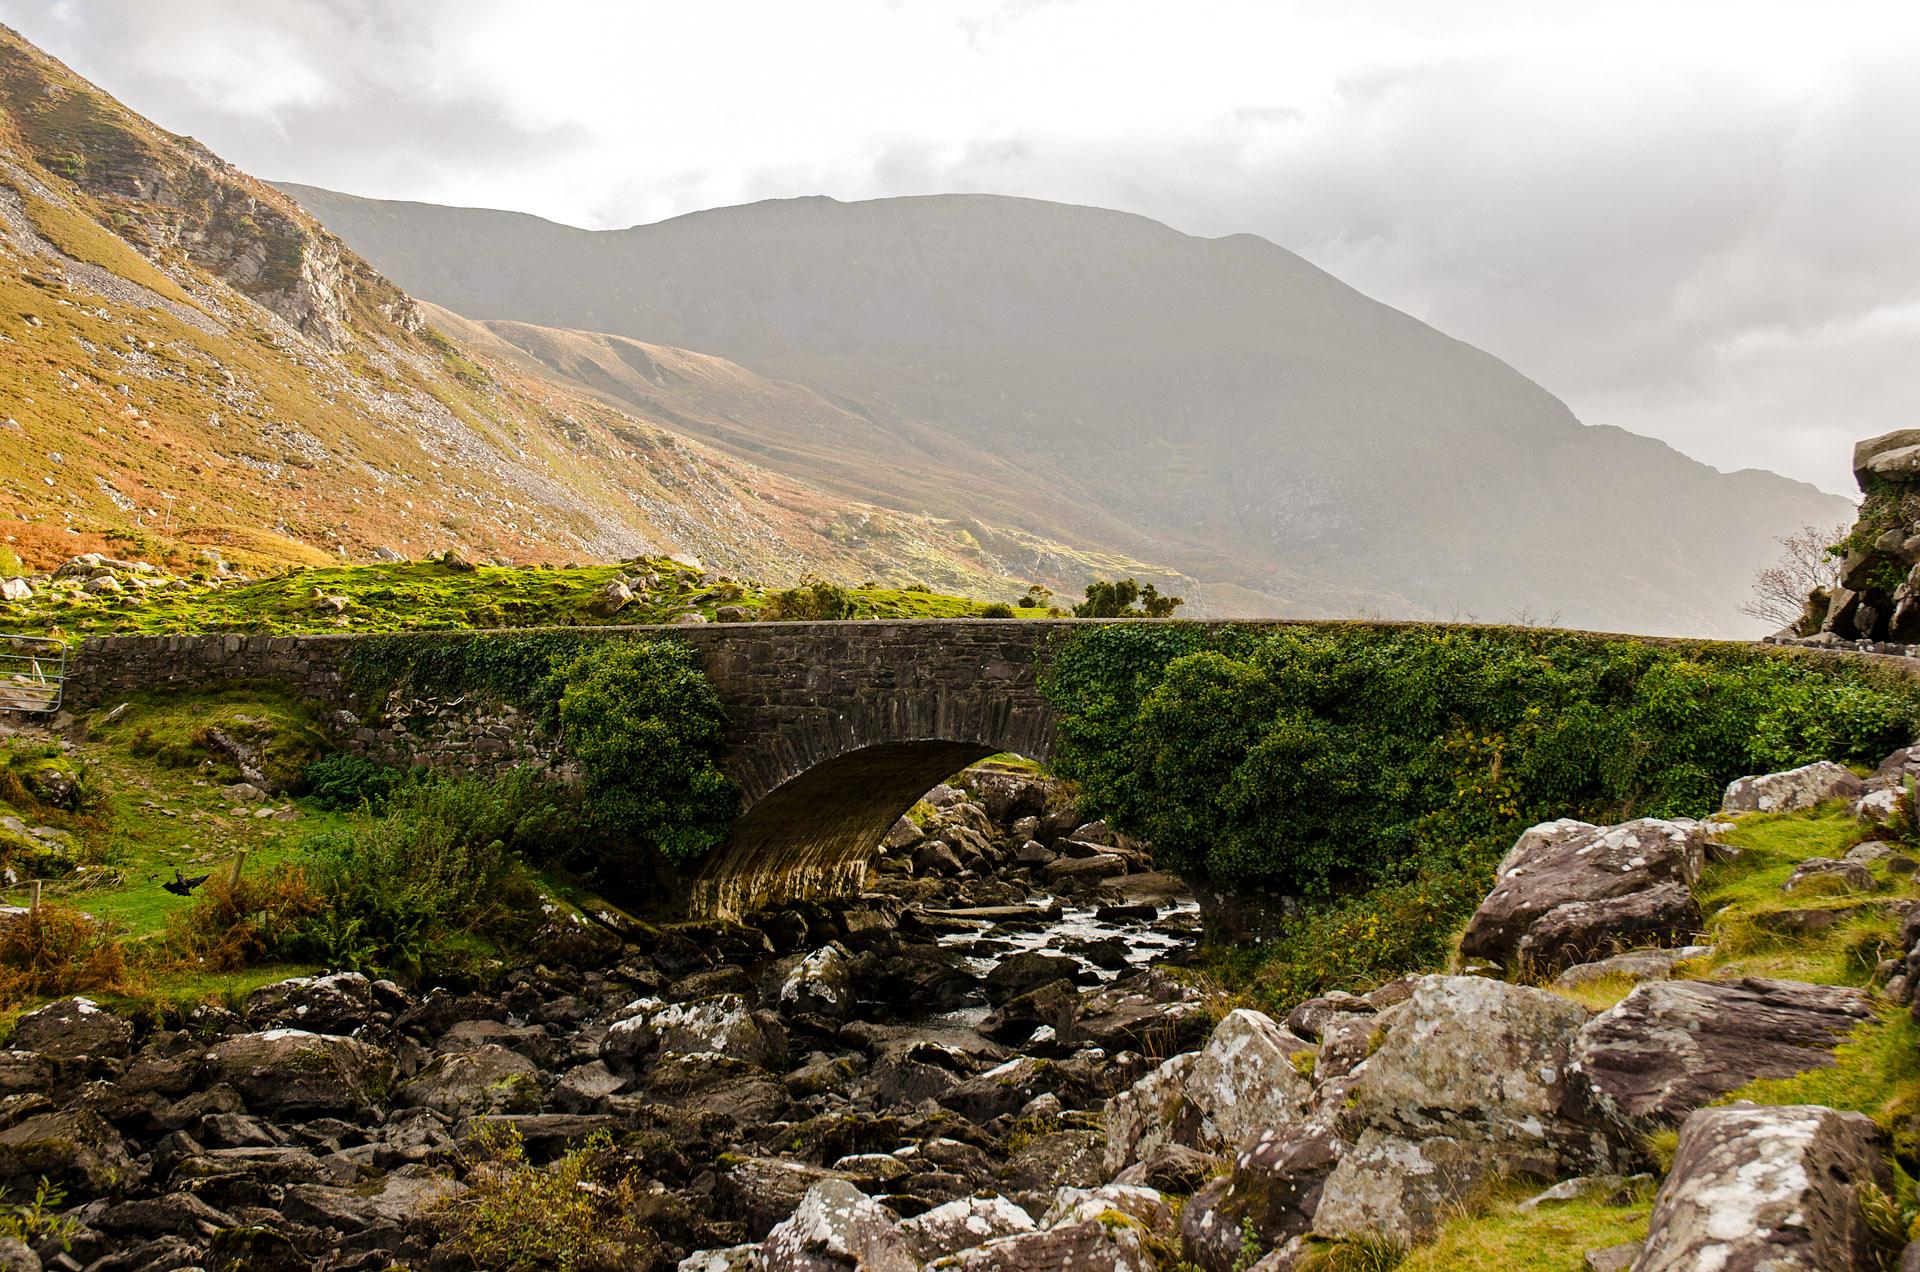 Wishing Bridge (Gap of Dunloe)